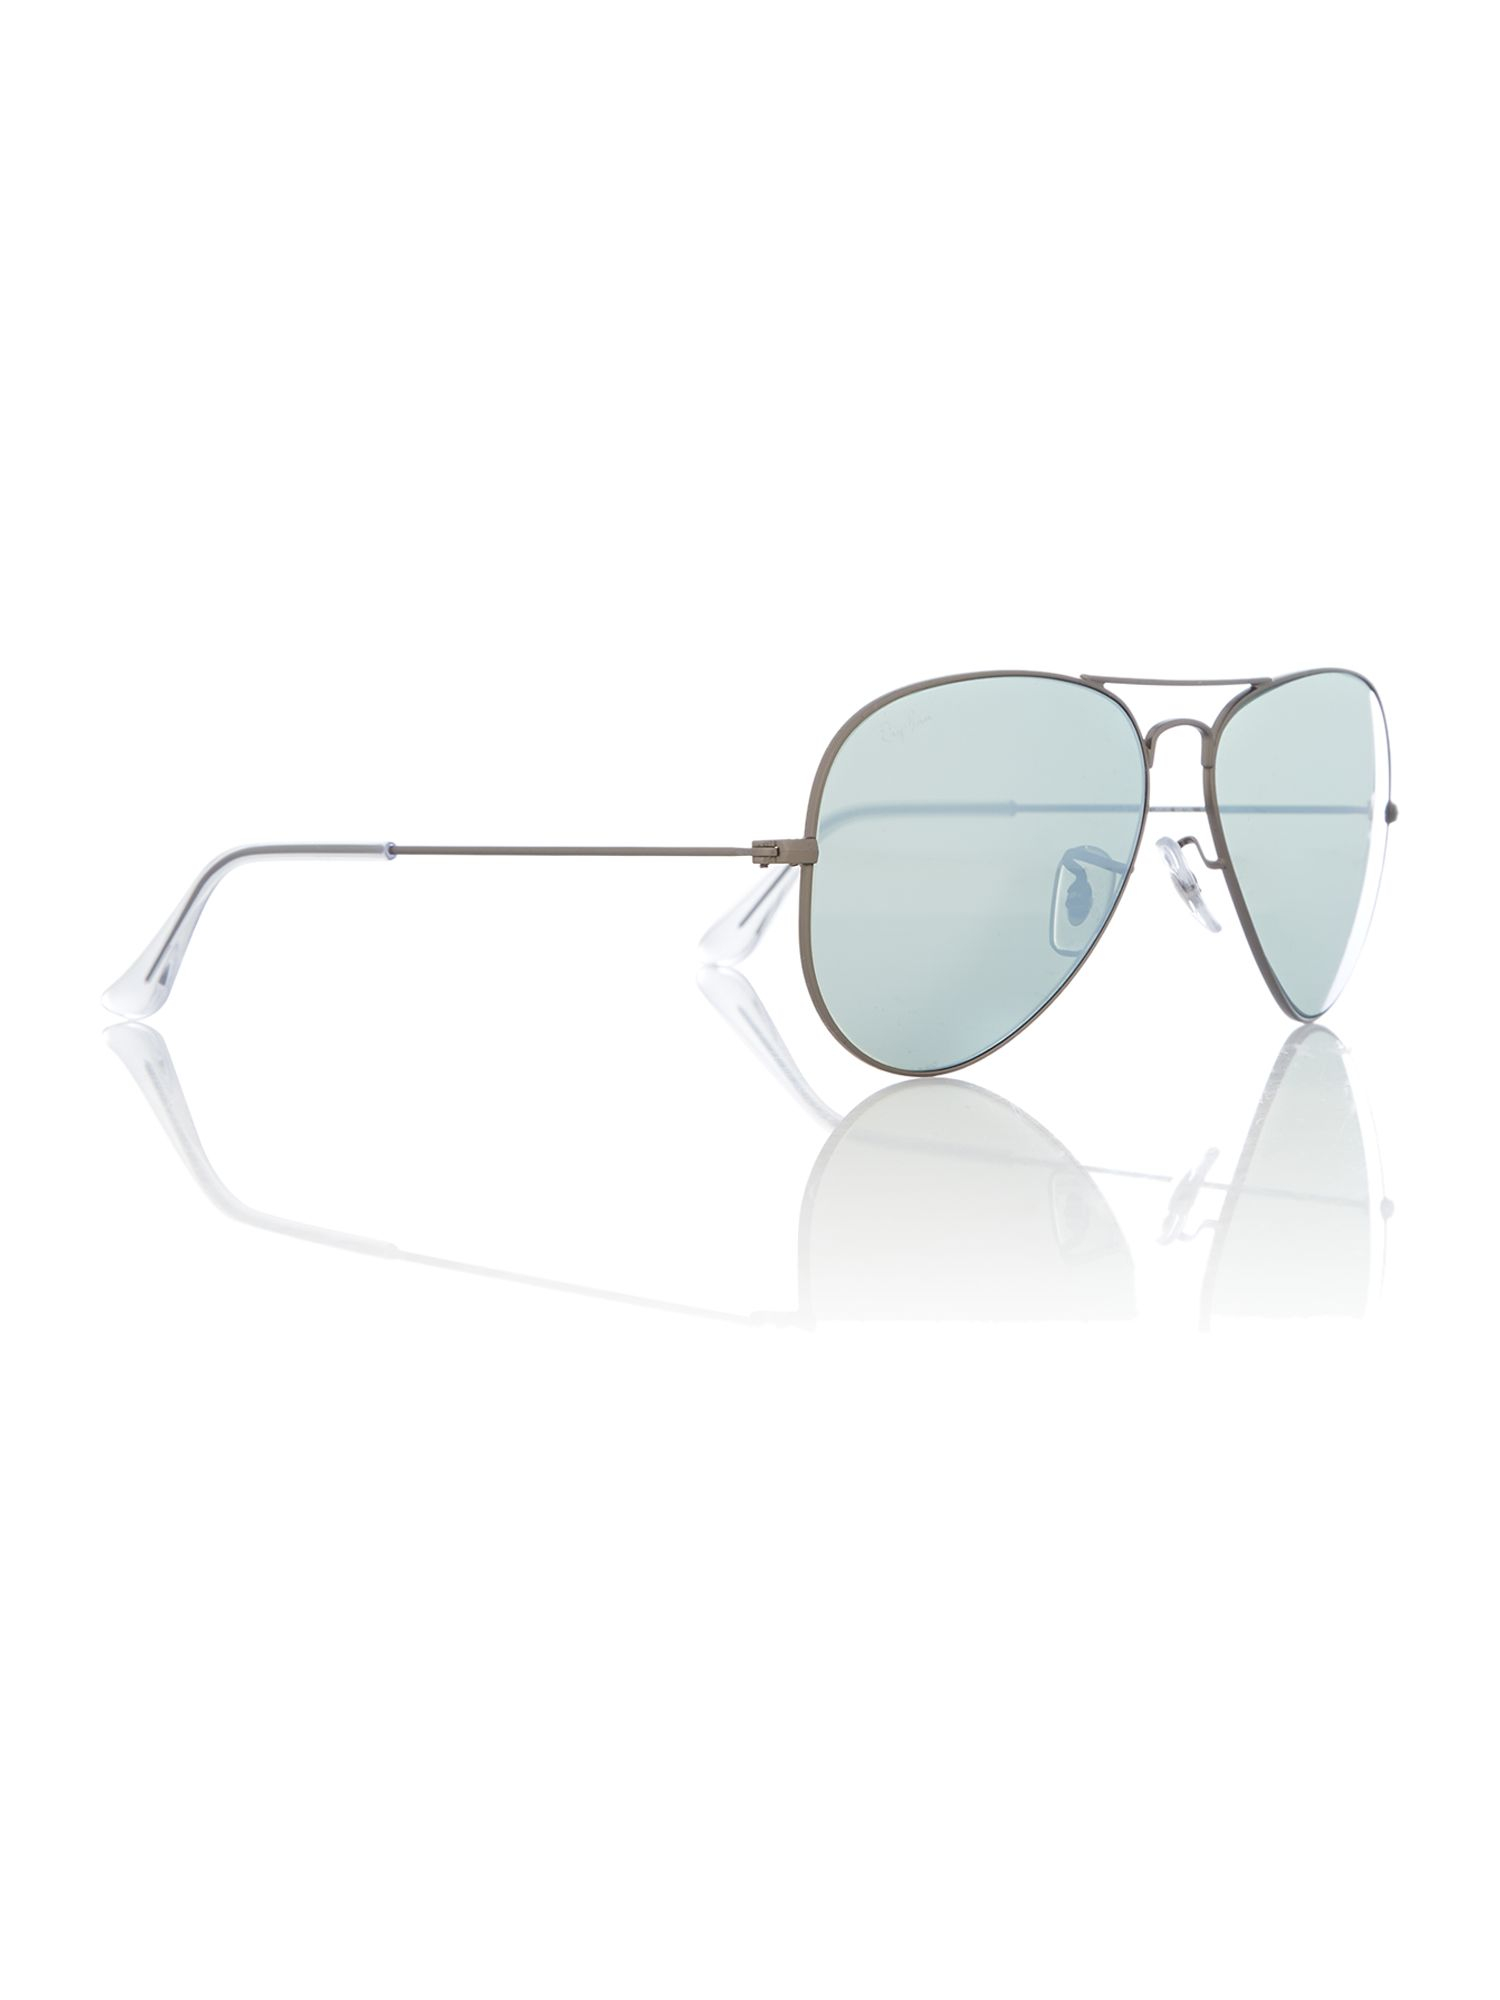 ff3c6347742 Extra Large Ray Ban Wayfarer Sunglasses « Heritage Malta